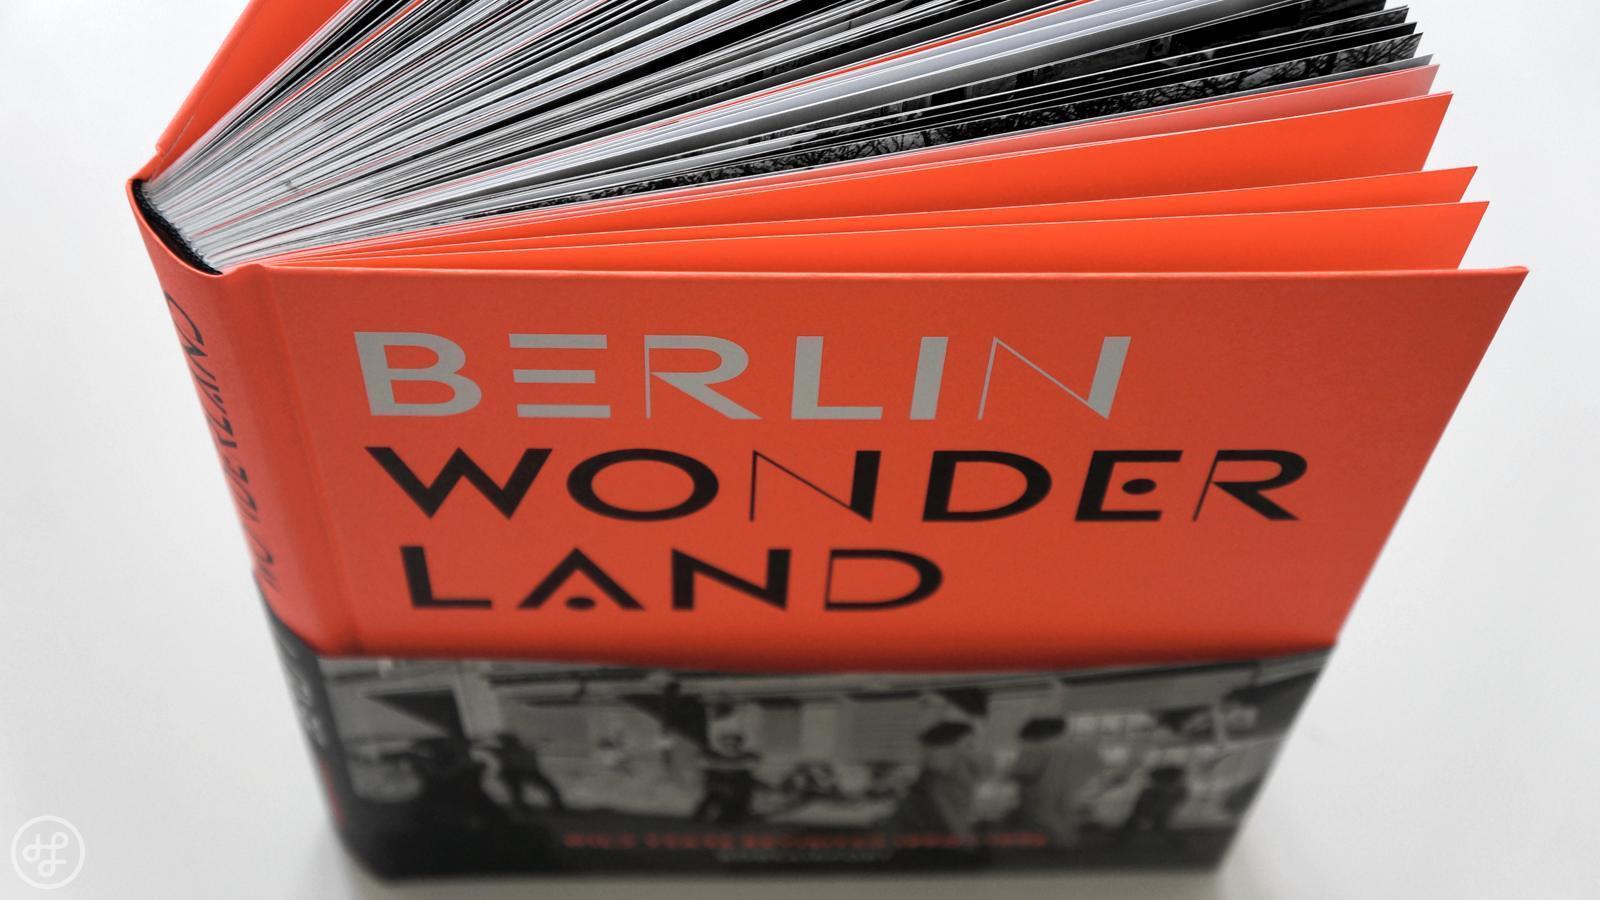 Berlin Wonderland Lead